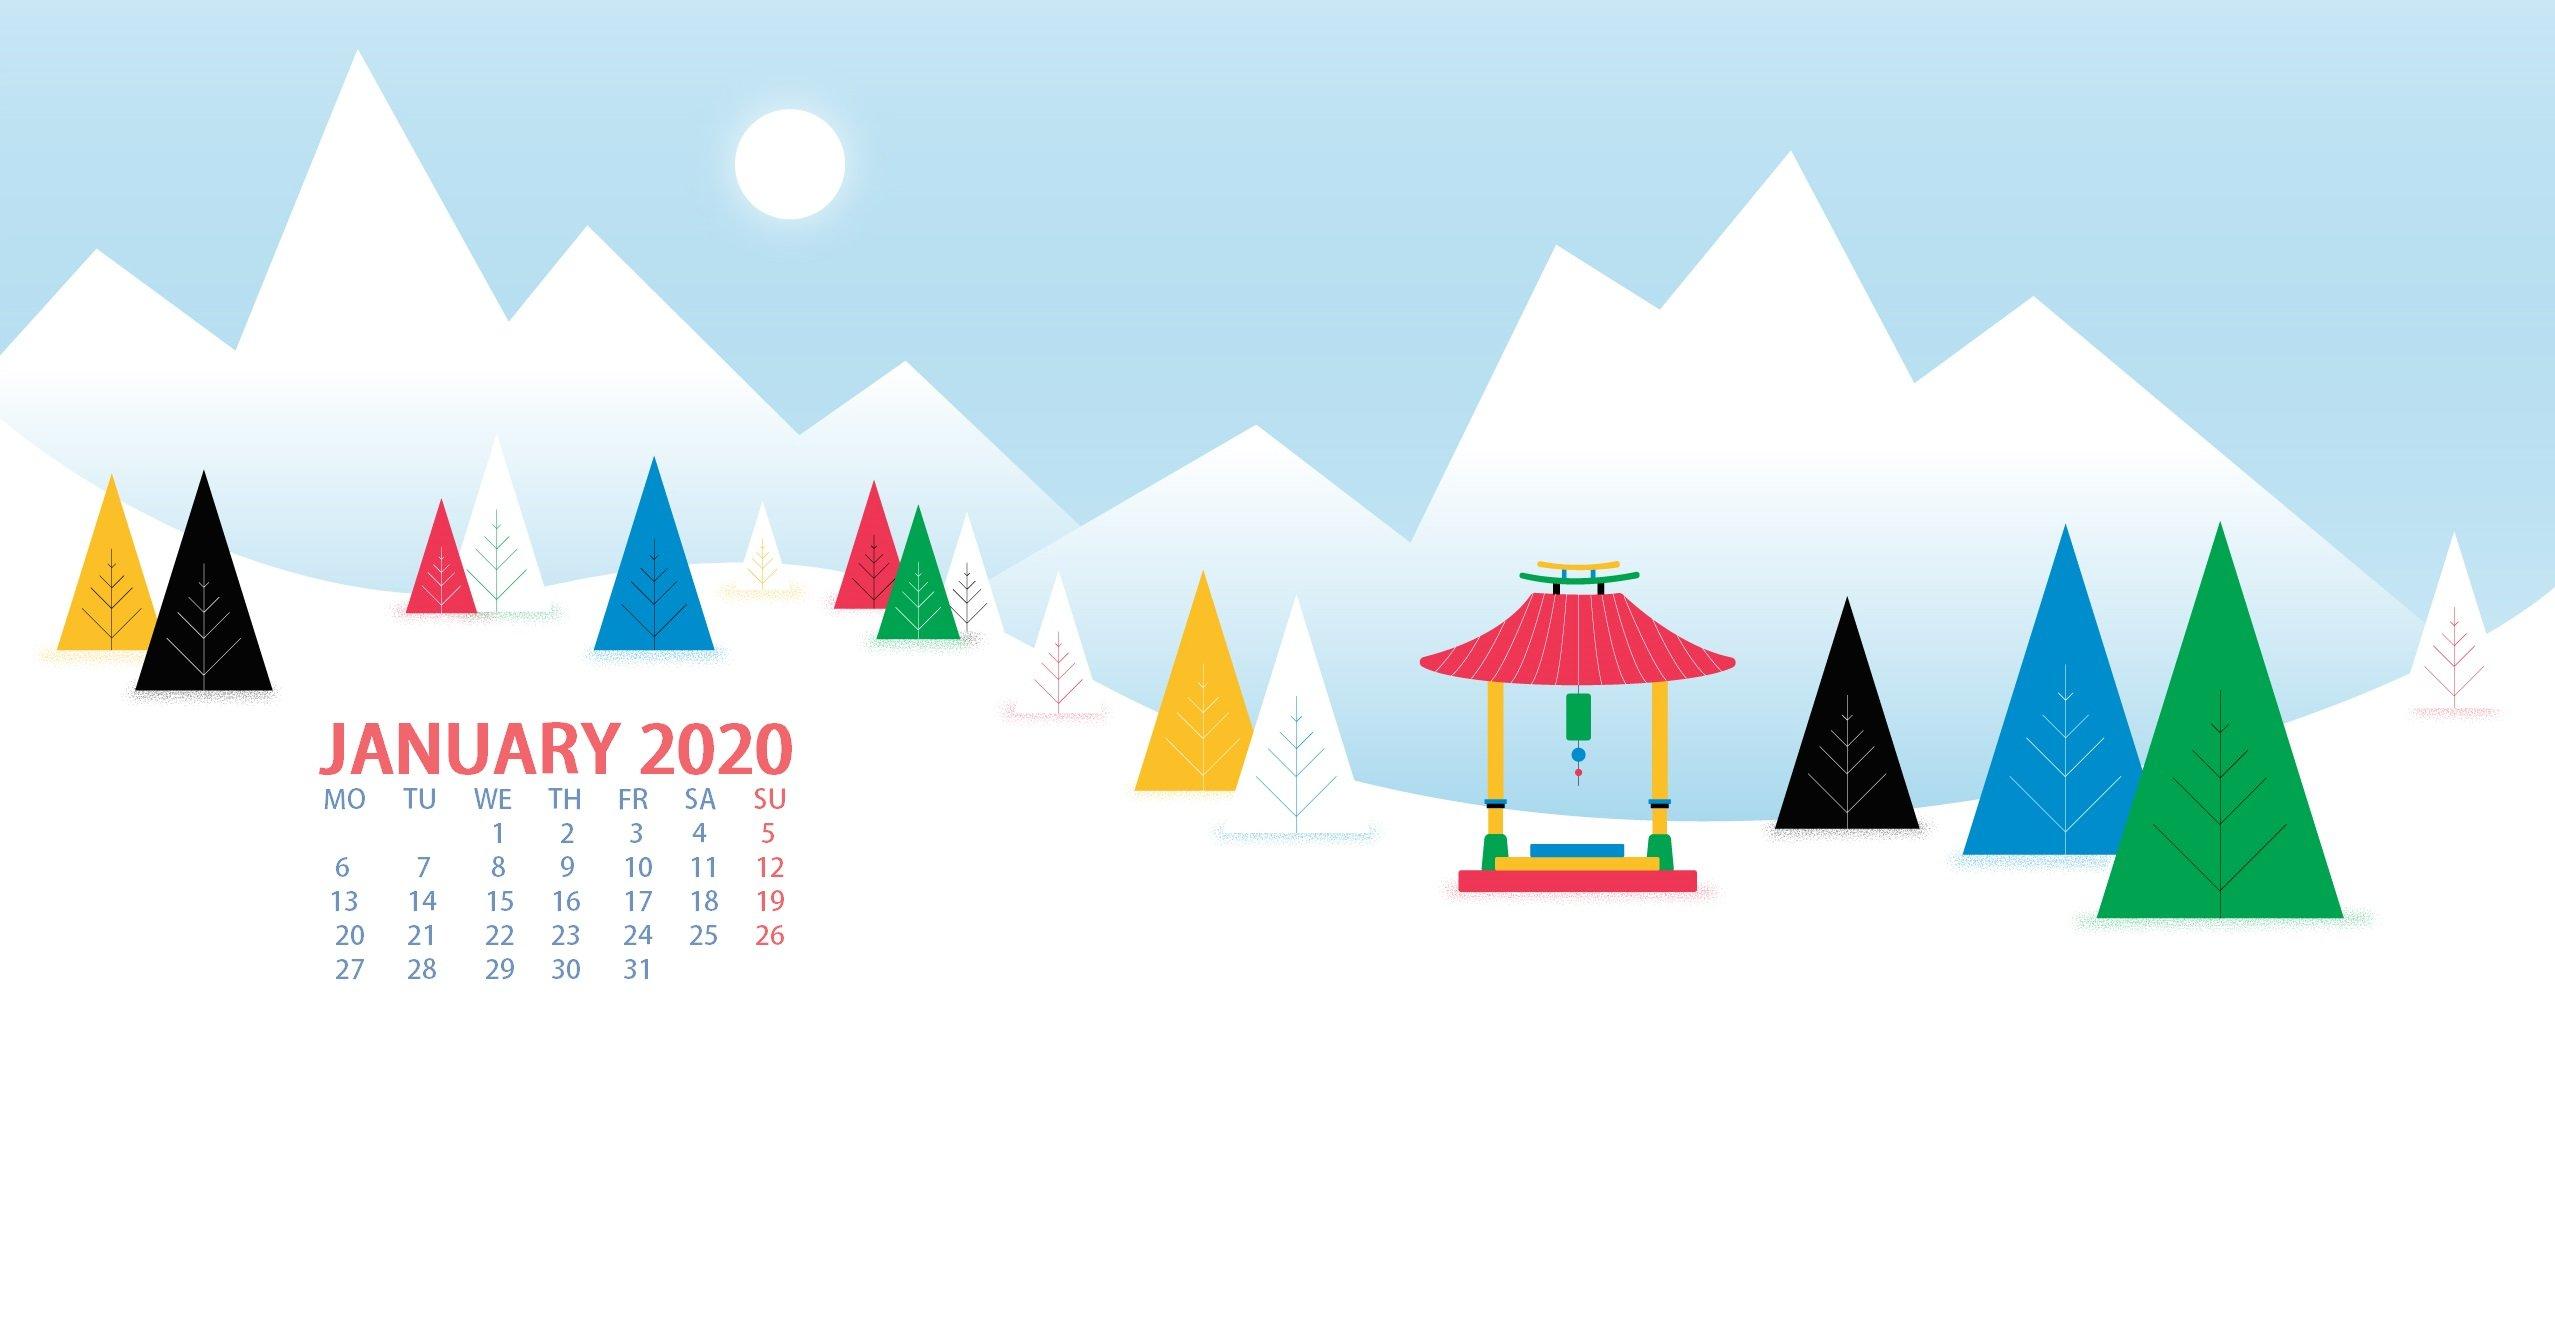 download January 2020 Desktop Calendar Wallpaper Max 2555x1337